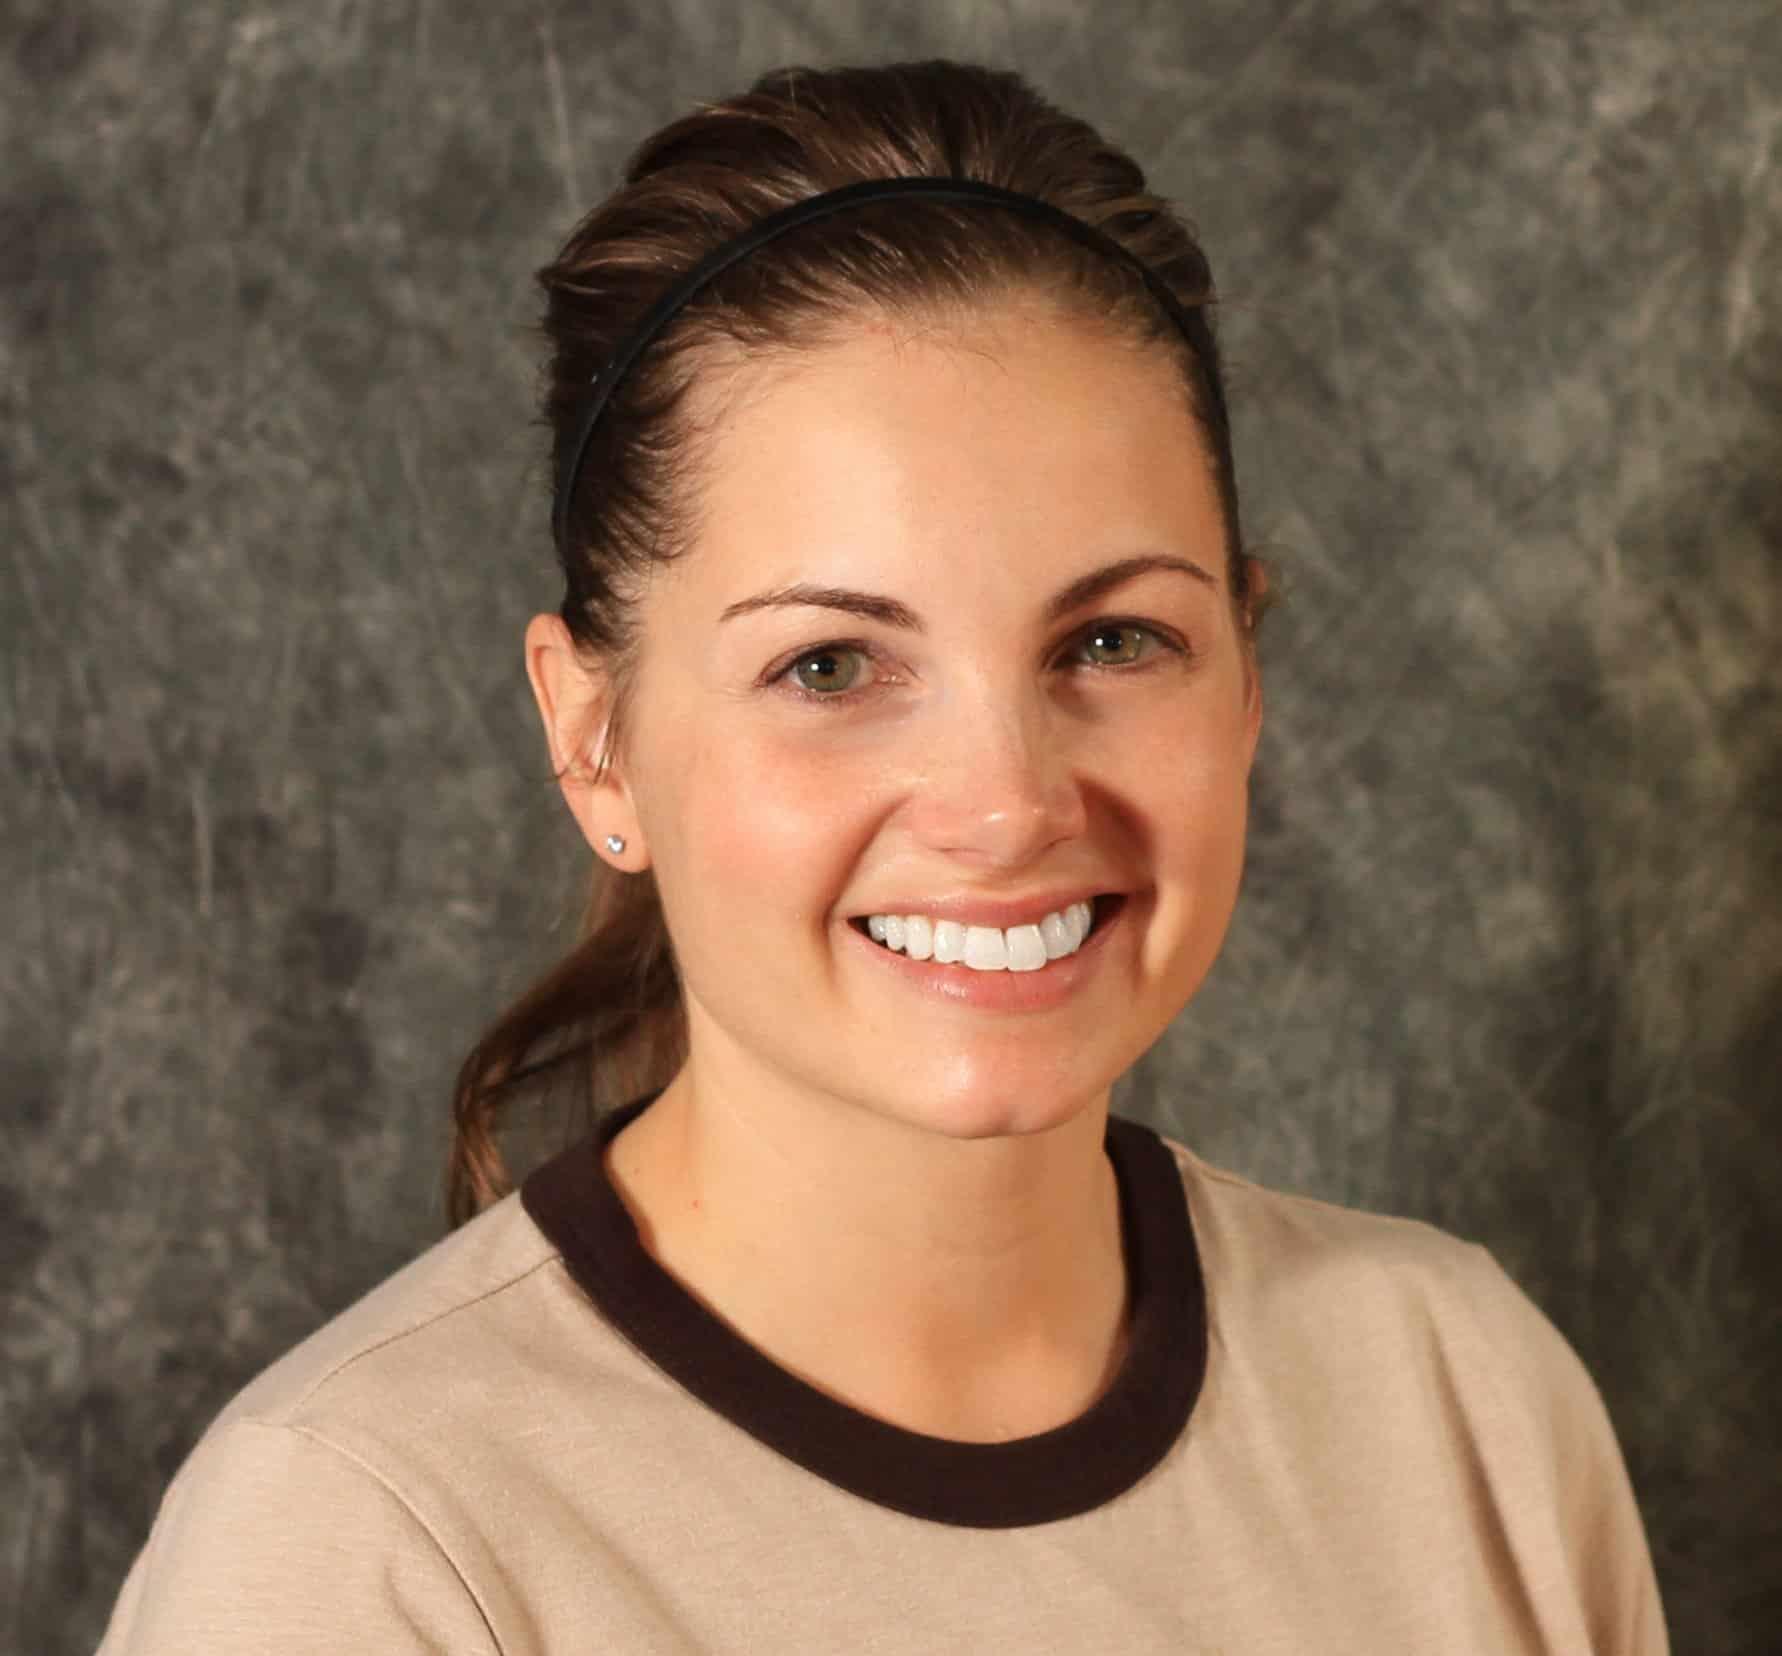 Shannon Garland